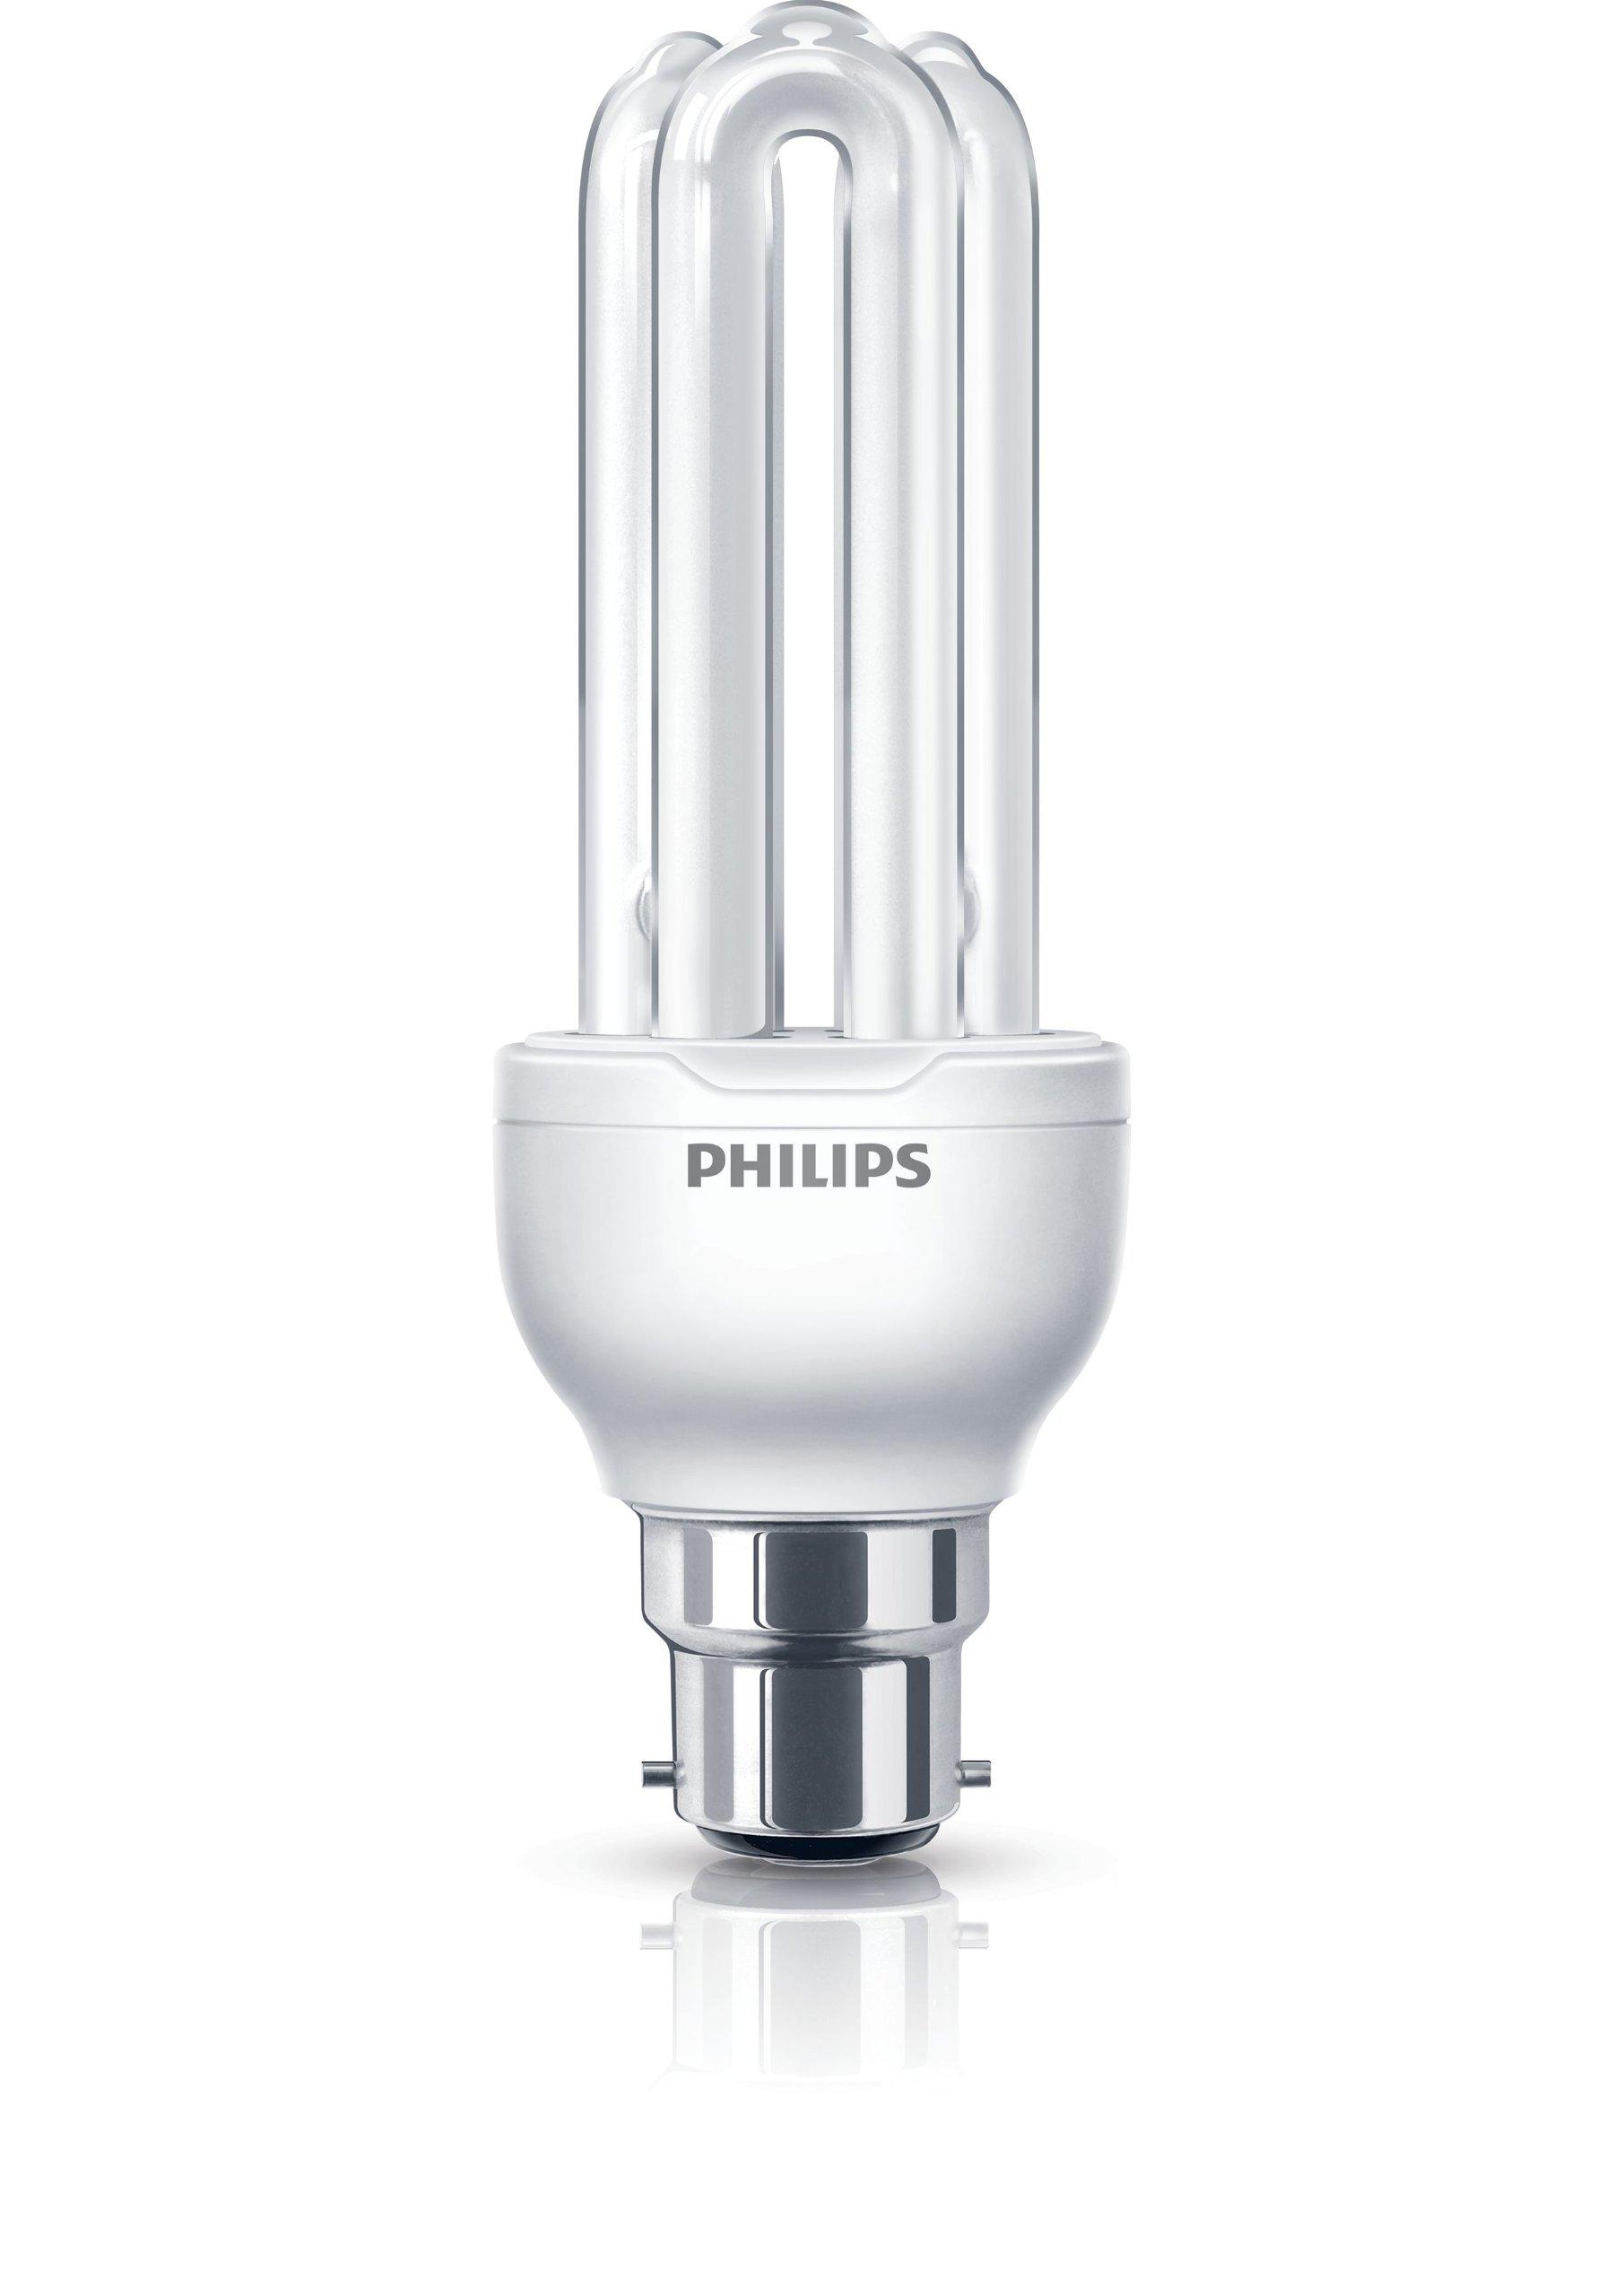 Philips Economy Compact Stick Light Bulb (B22 Bayonet Cap), 18 W - Fluorescent